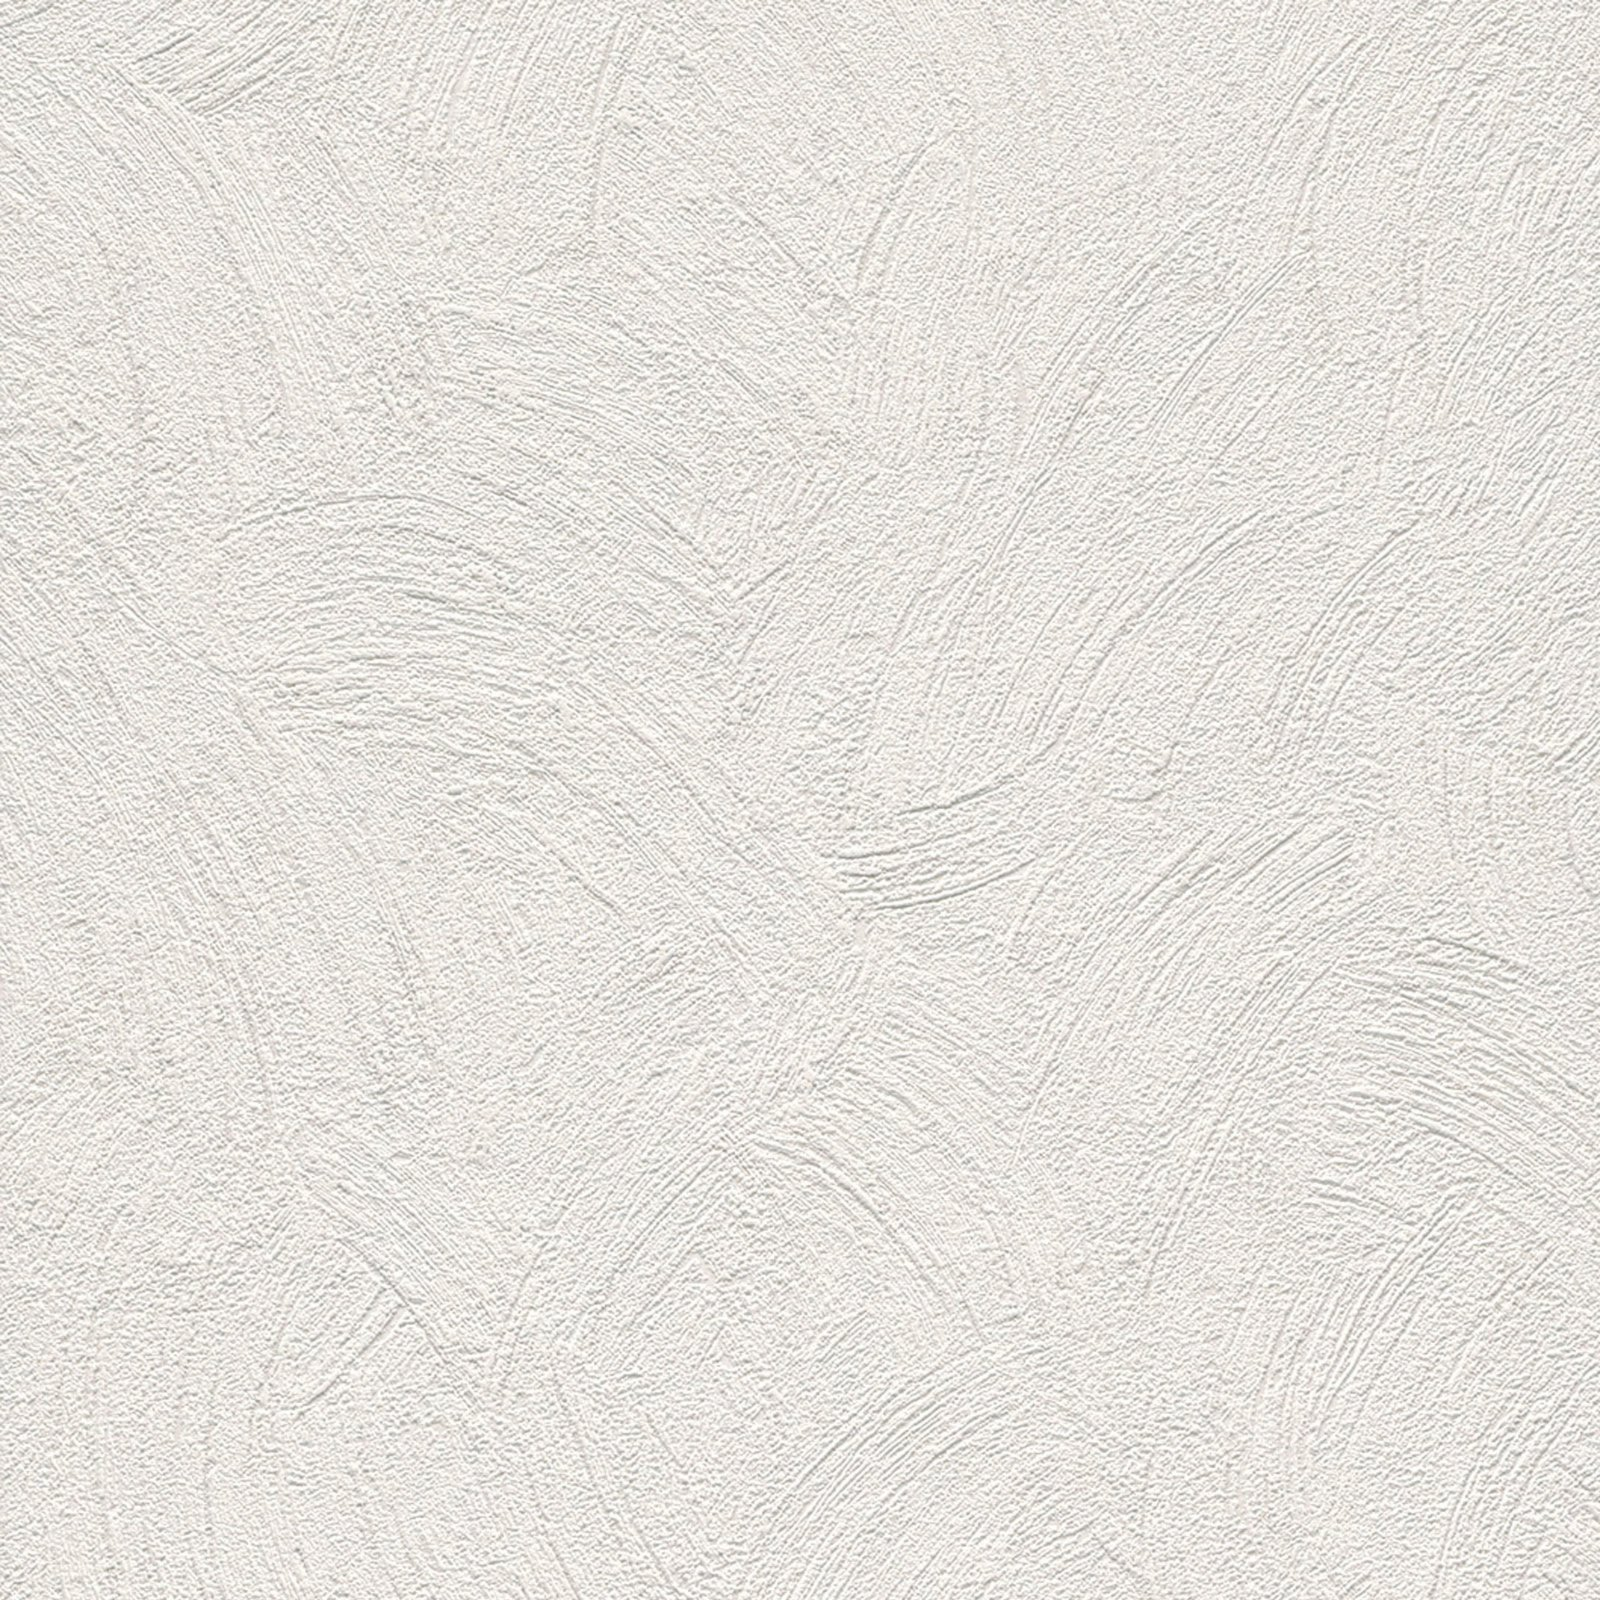 Vliestapete beige putzstruktur 10 meter for Roller tapeten